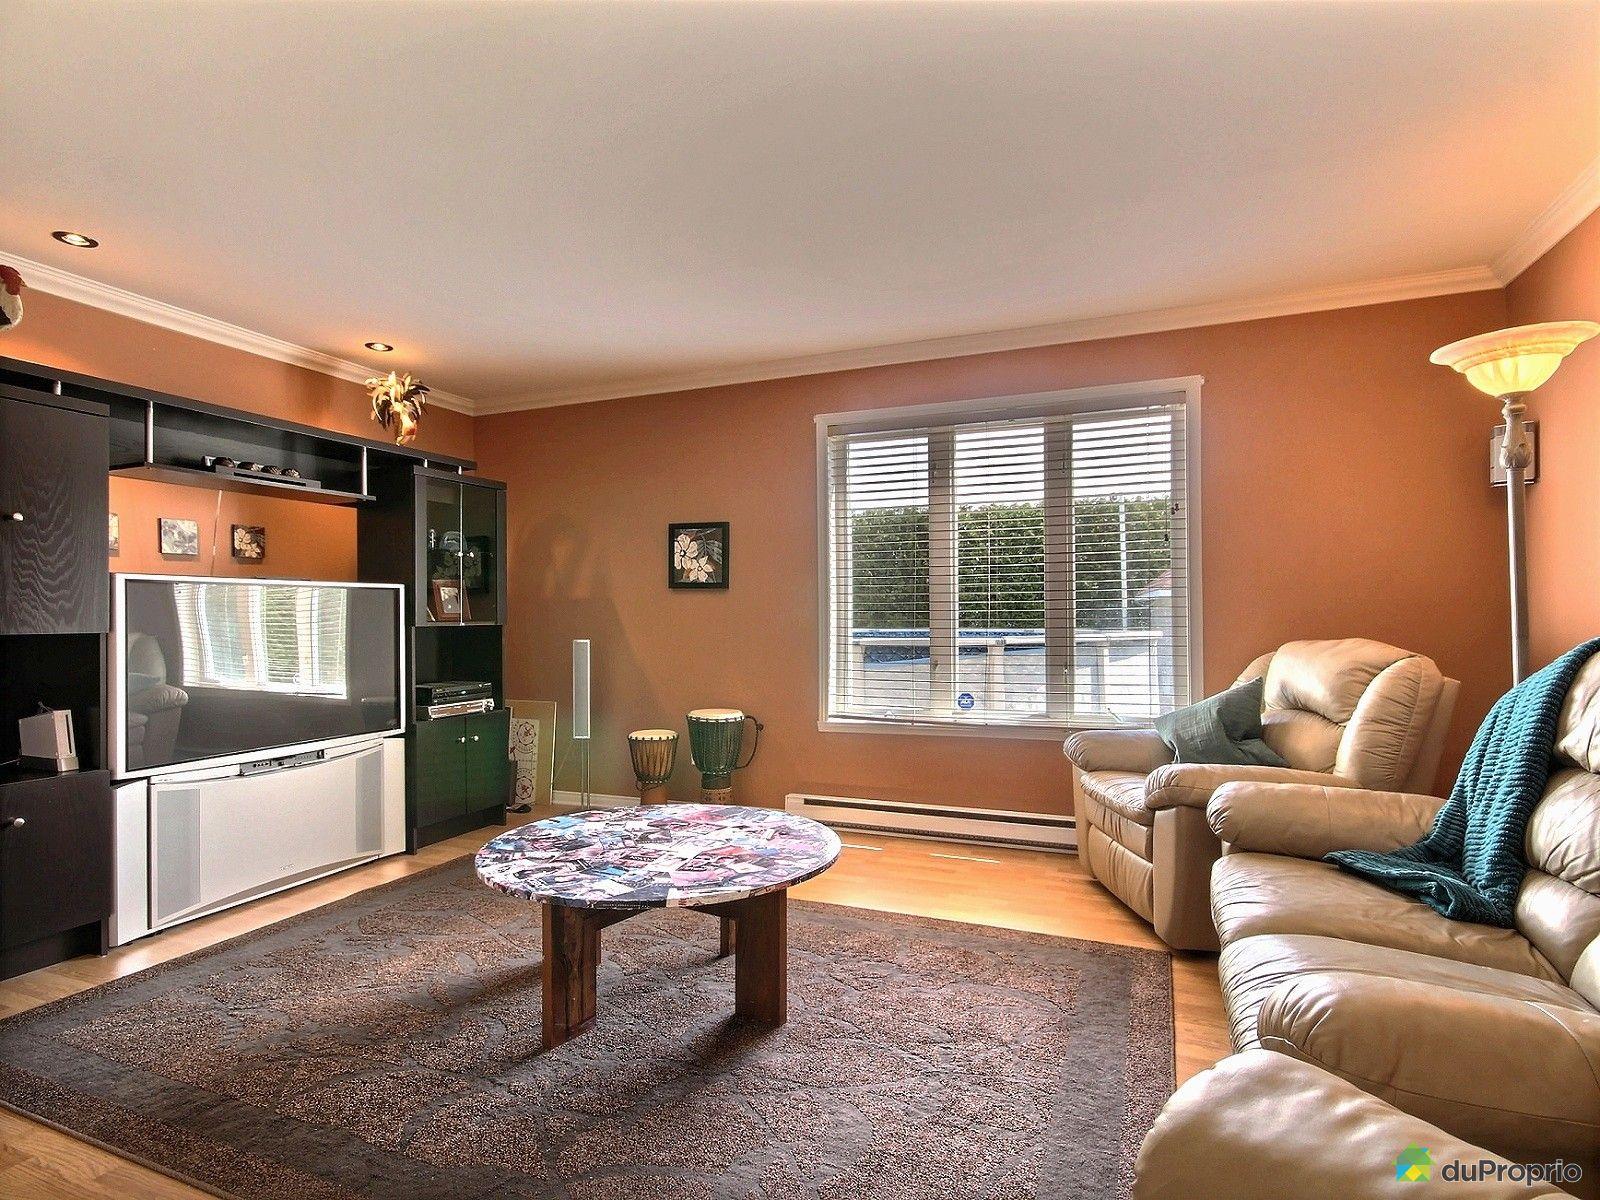 maison vendu st j r me immobilier qu bec duproprio 512097. Black Bedroom Furniture Sets. Home Design Ideas